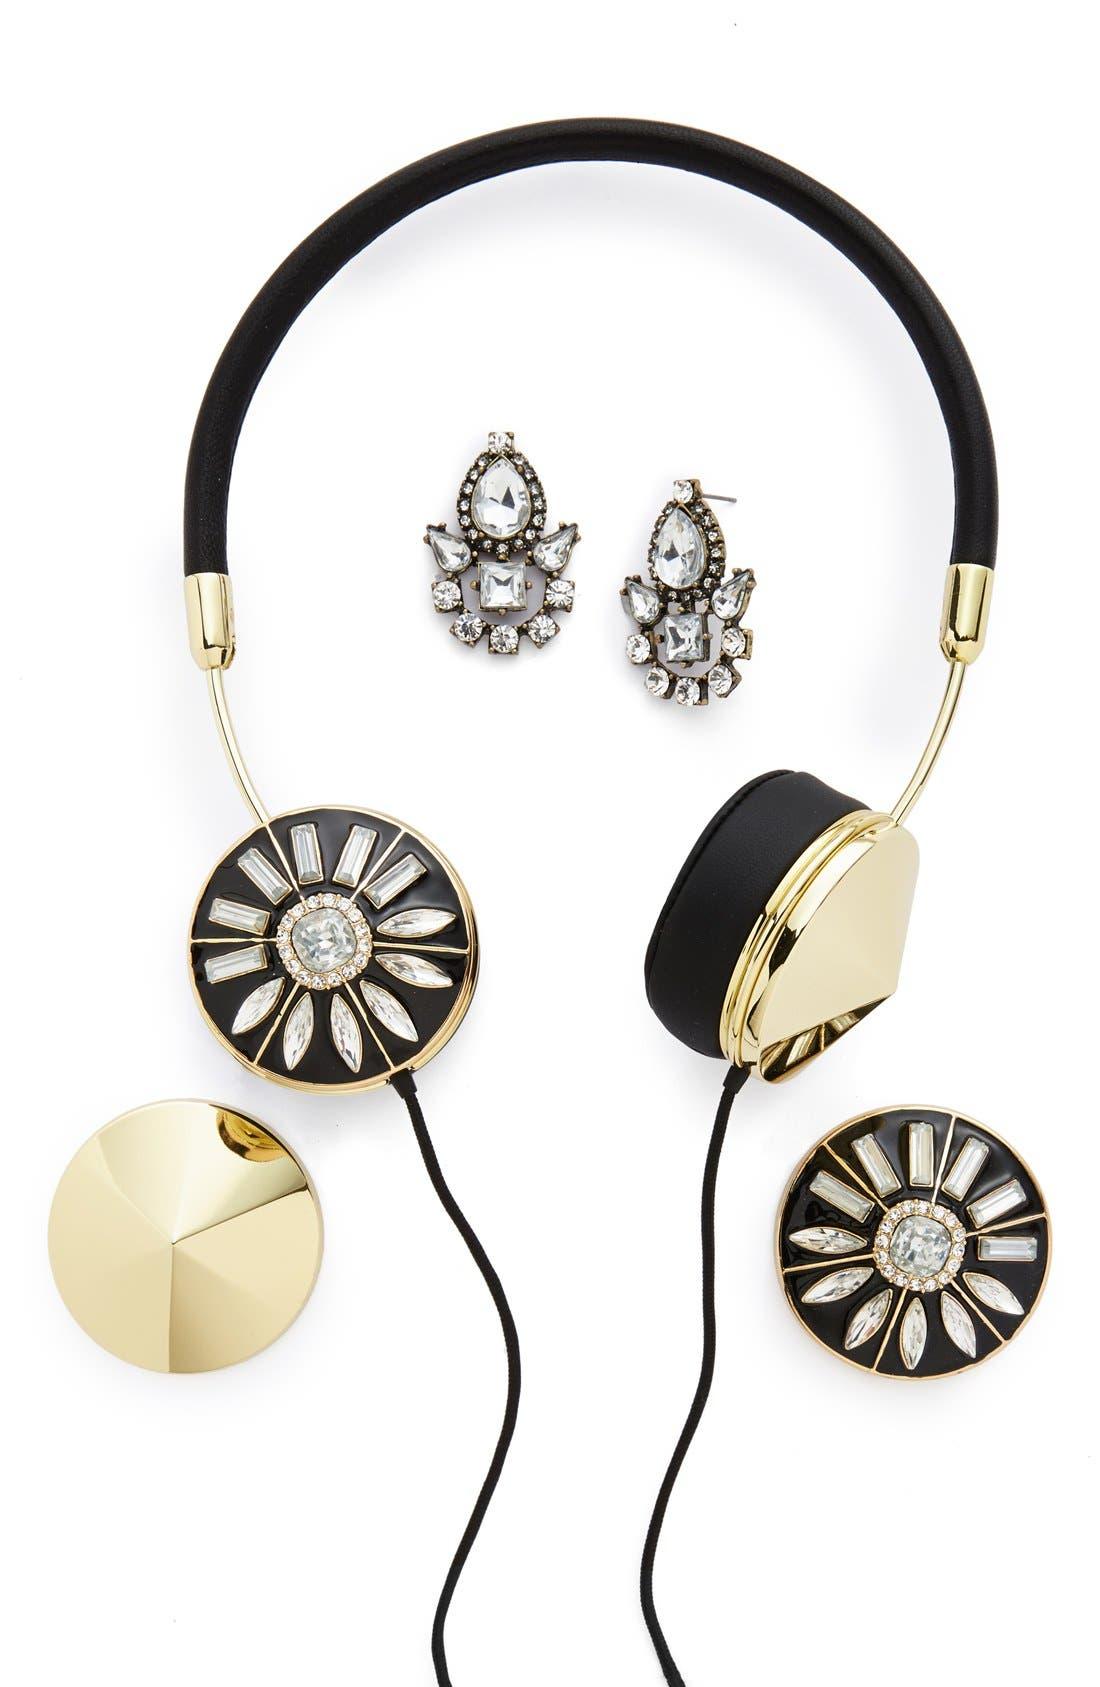 Main Image - Frends x BaubleBar 'Layla' Headphones